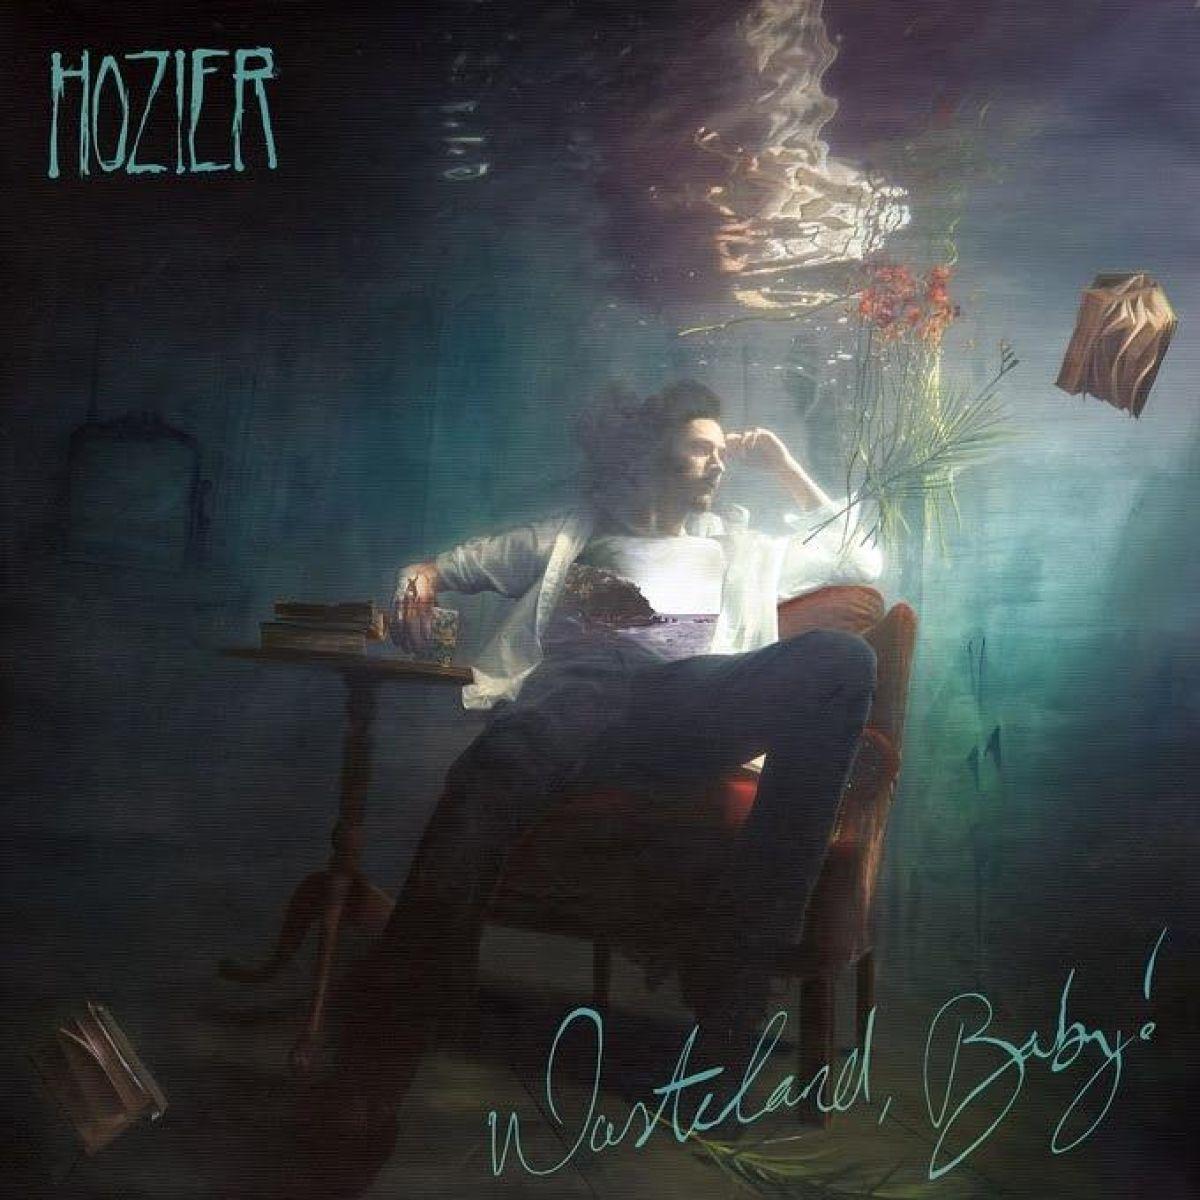 hozier-wasteland-baby-album